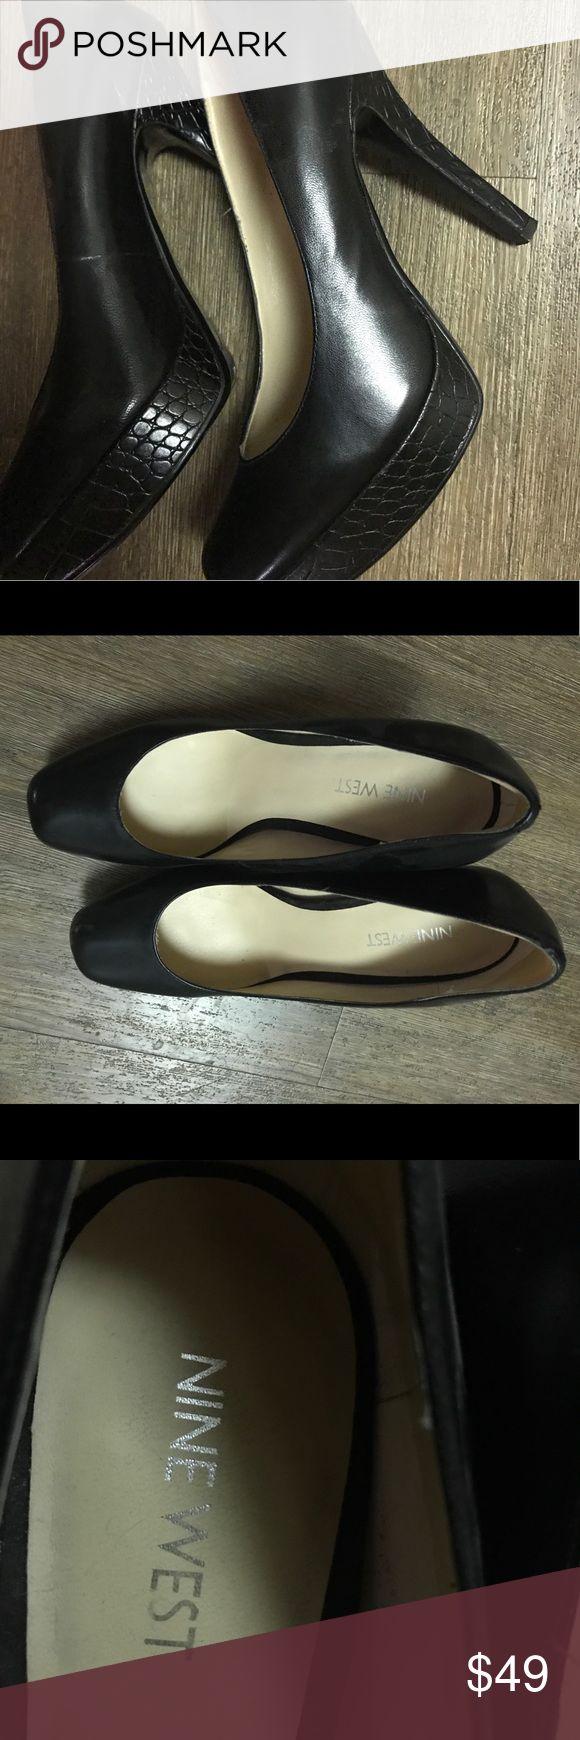 Nine West Heels - Leather Nine West Heels - Leather - Black Nine West Shoes Heels